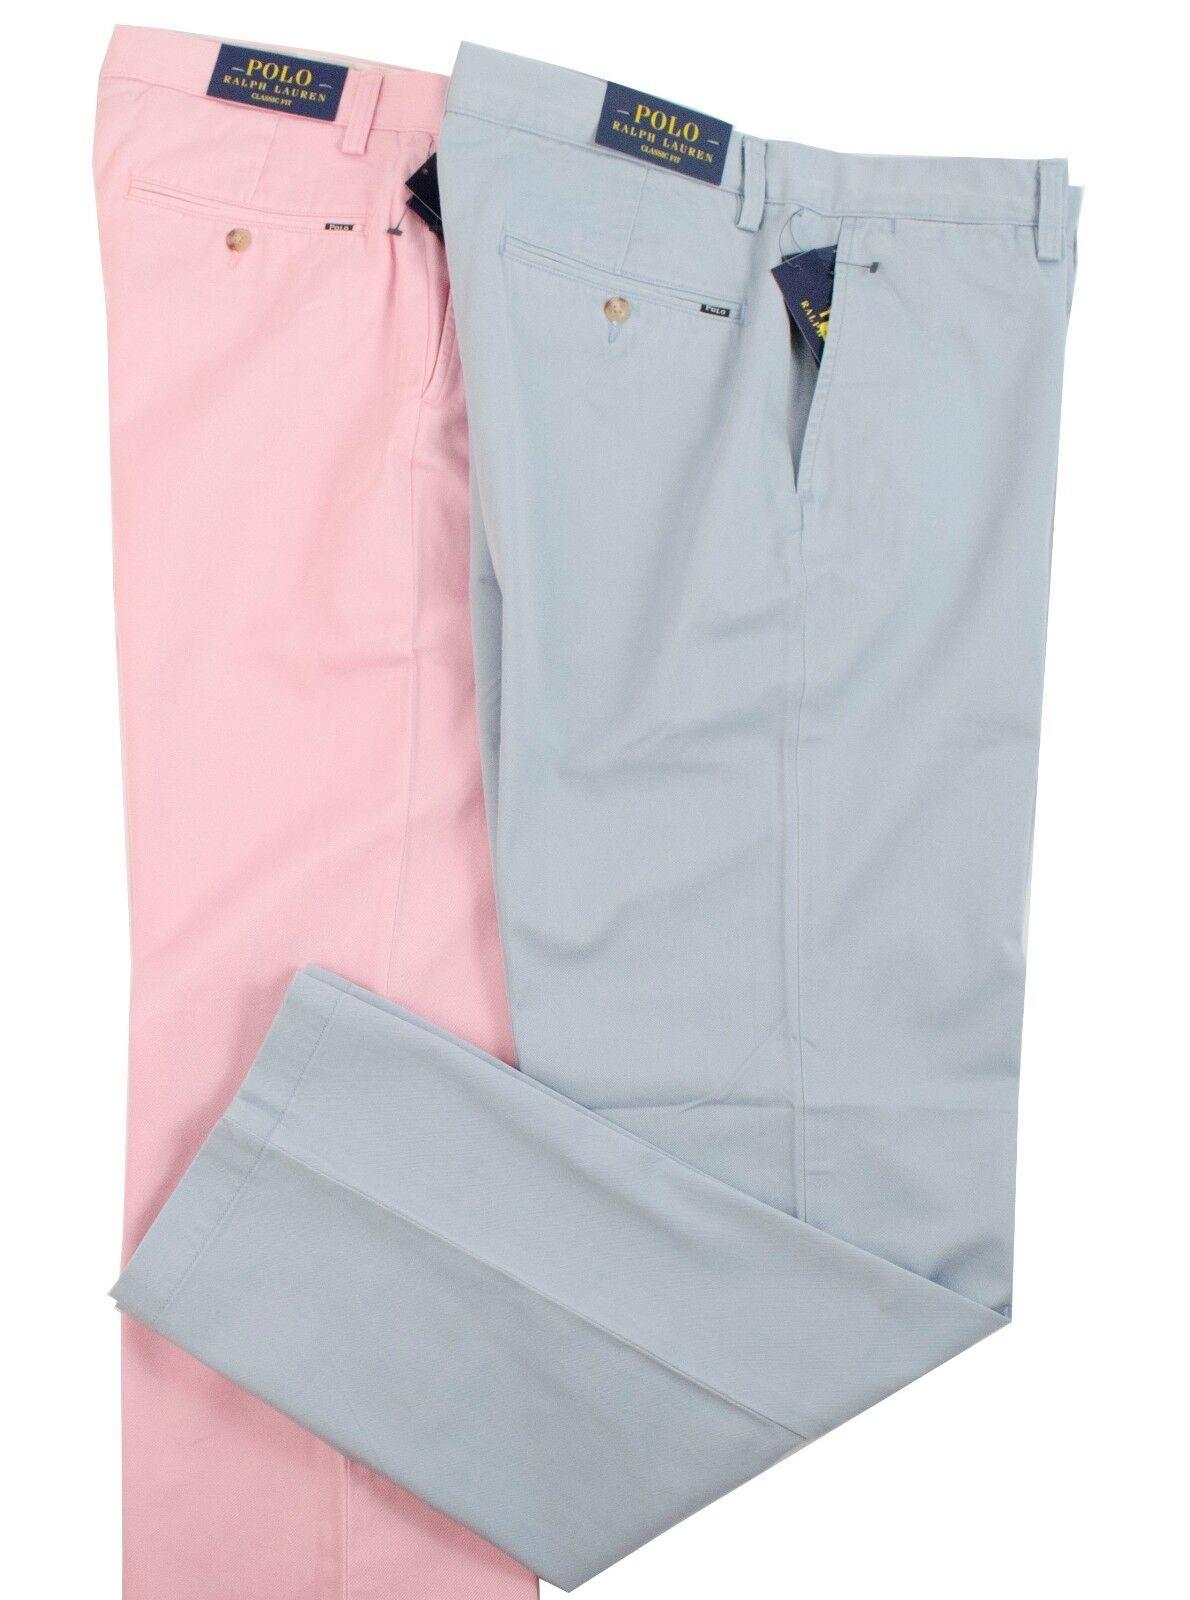 POLO RALPH LAUREN CLASSIC FIT FOSTER PINK HAMPTON blueE LOGO MEN FLAT FRONT PANTS